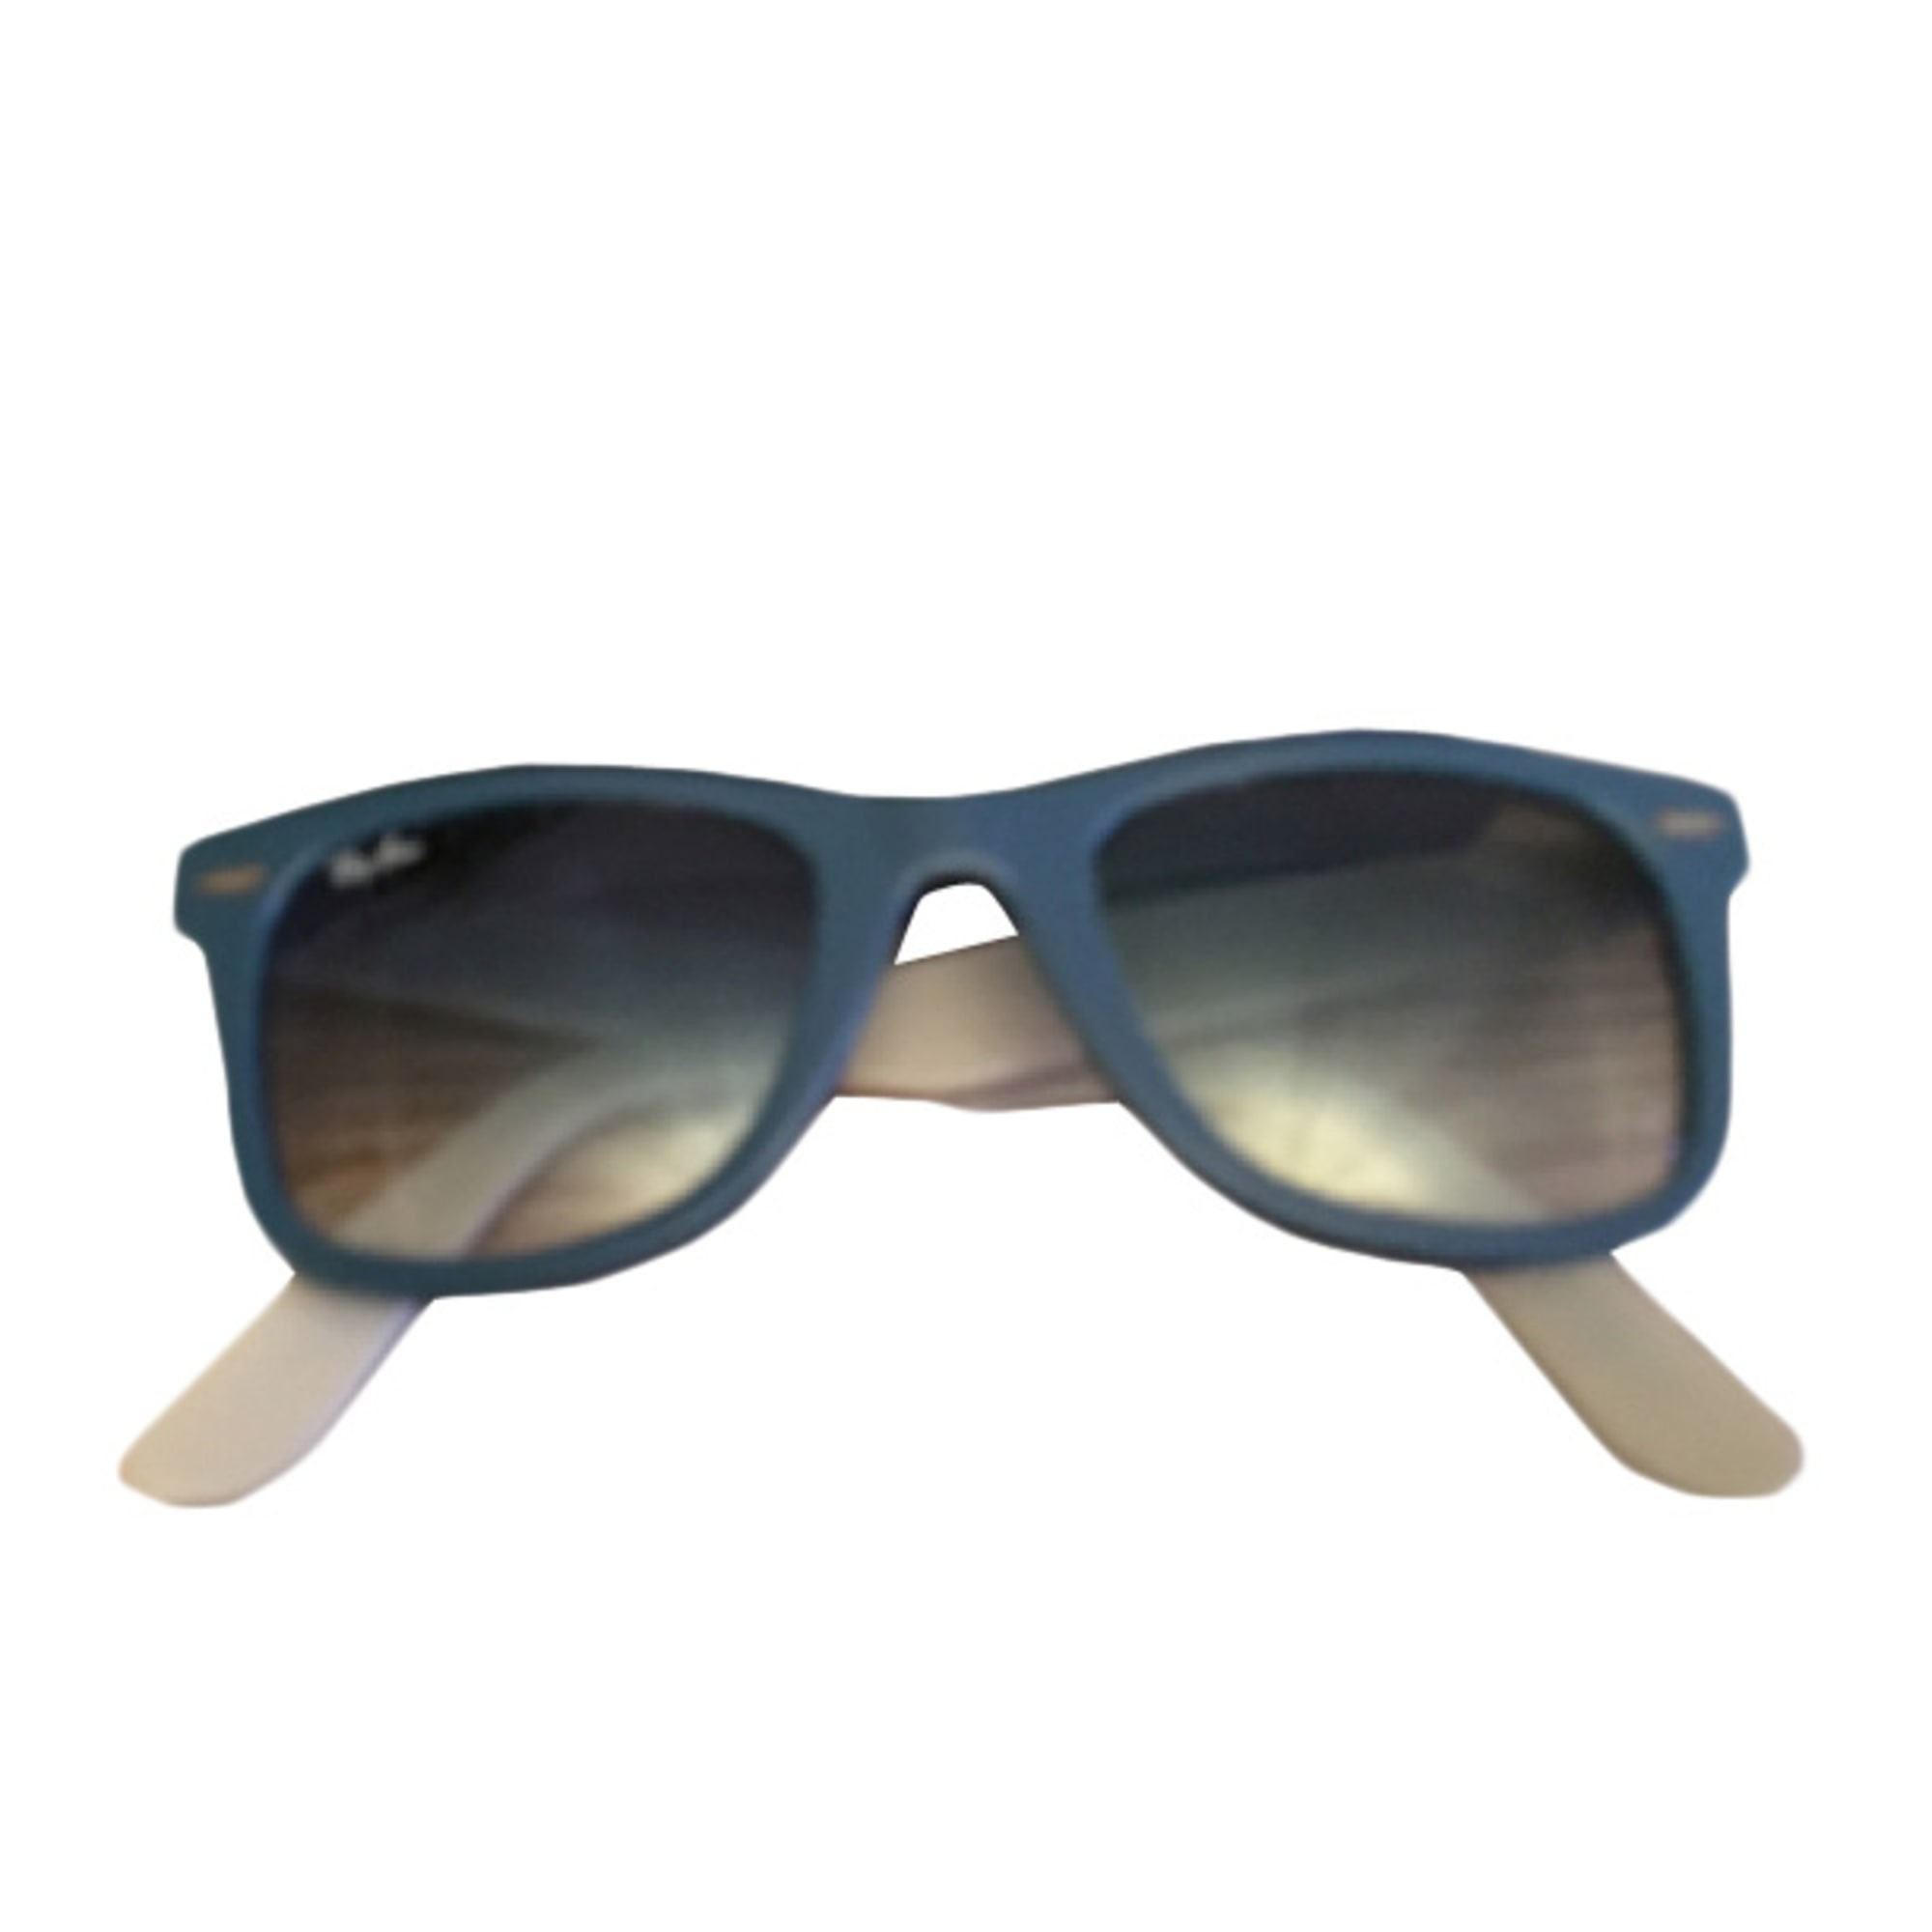 42372009e7 Lunettes de soleil RAY-BAN Bleu, bleu marine, bleu turquoise